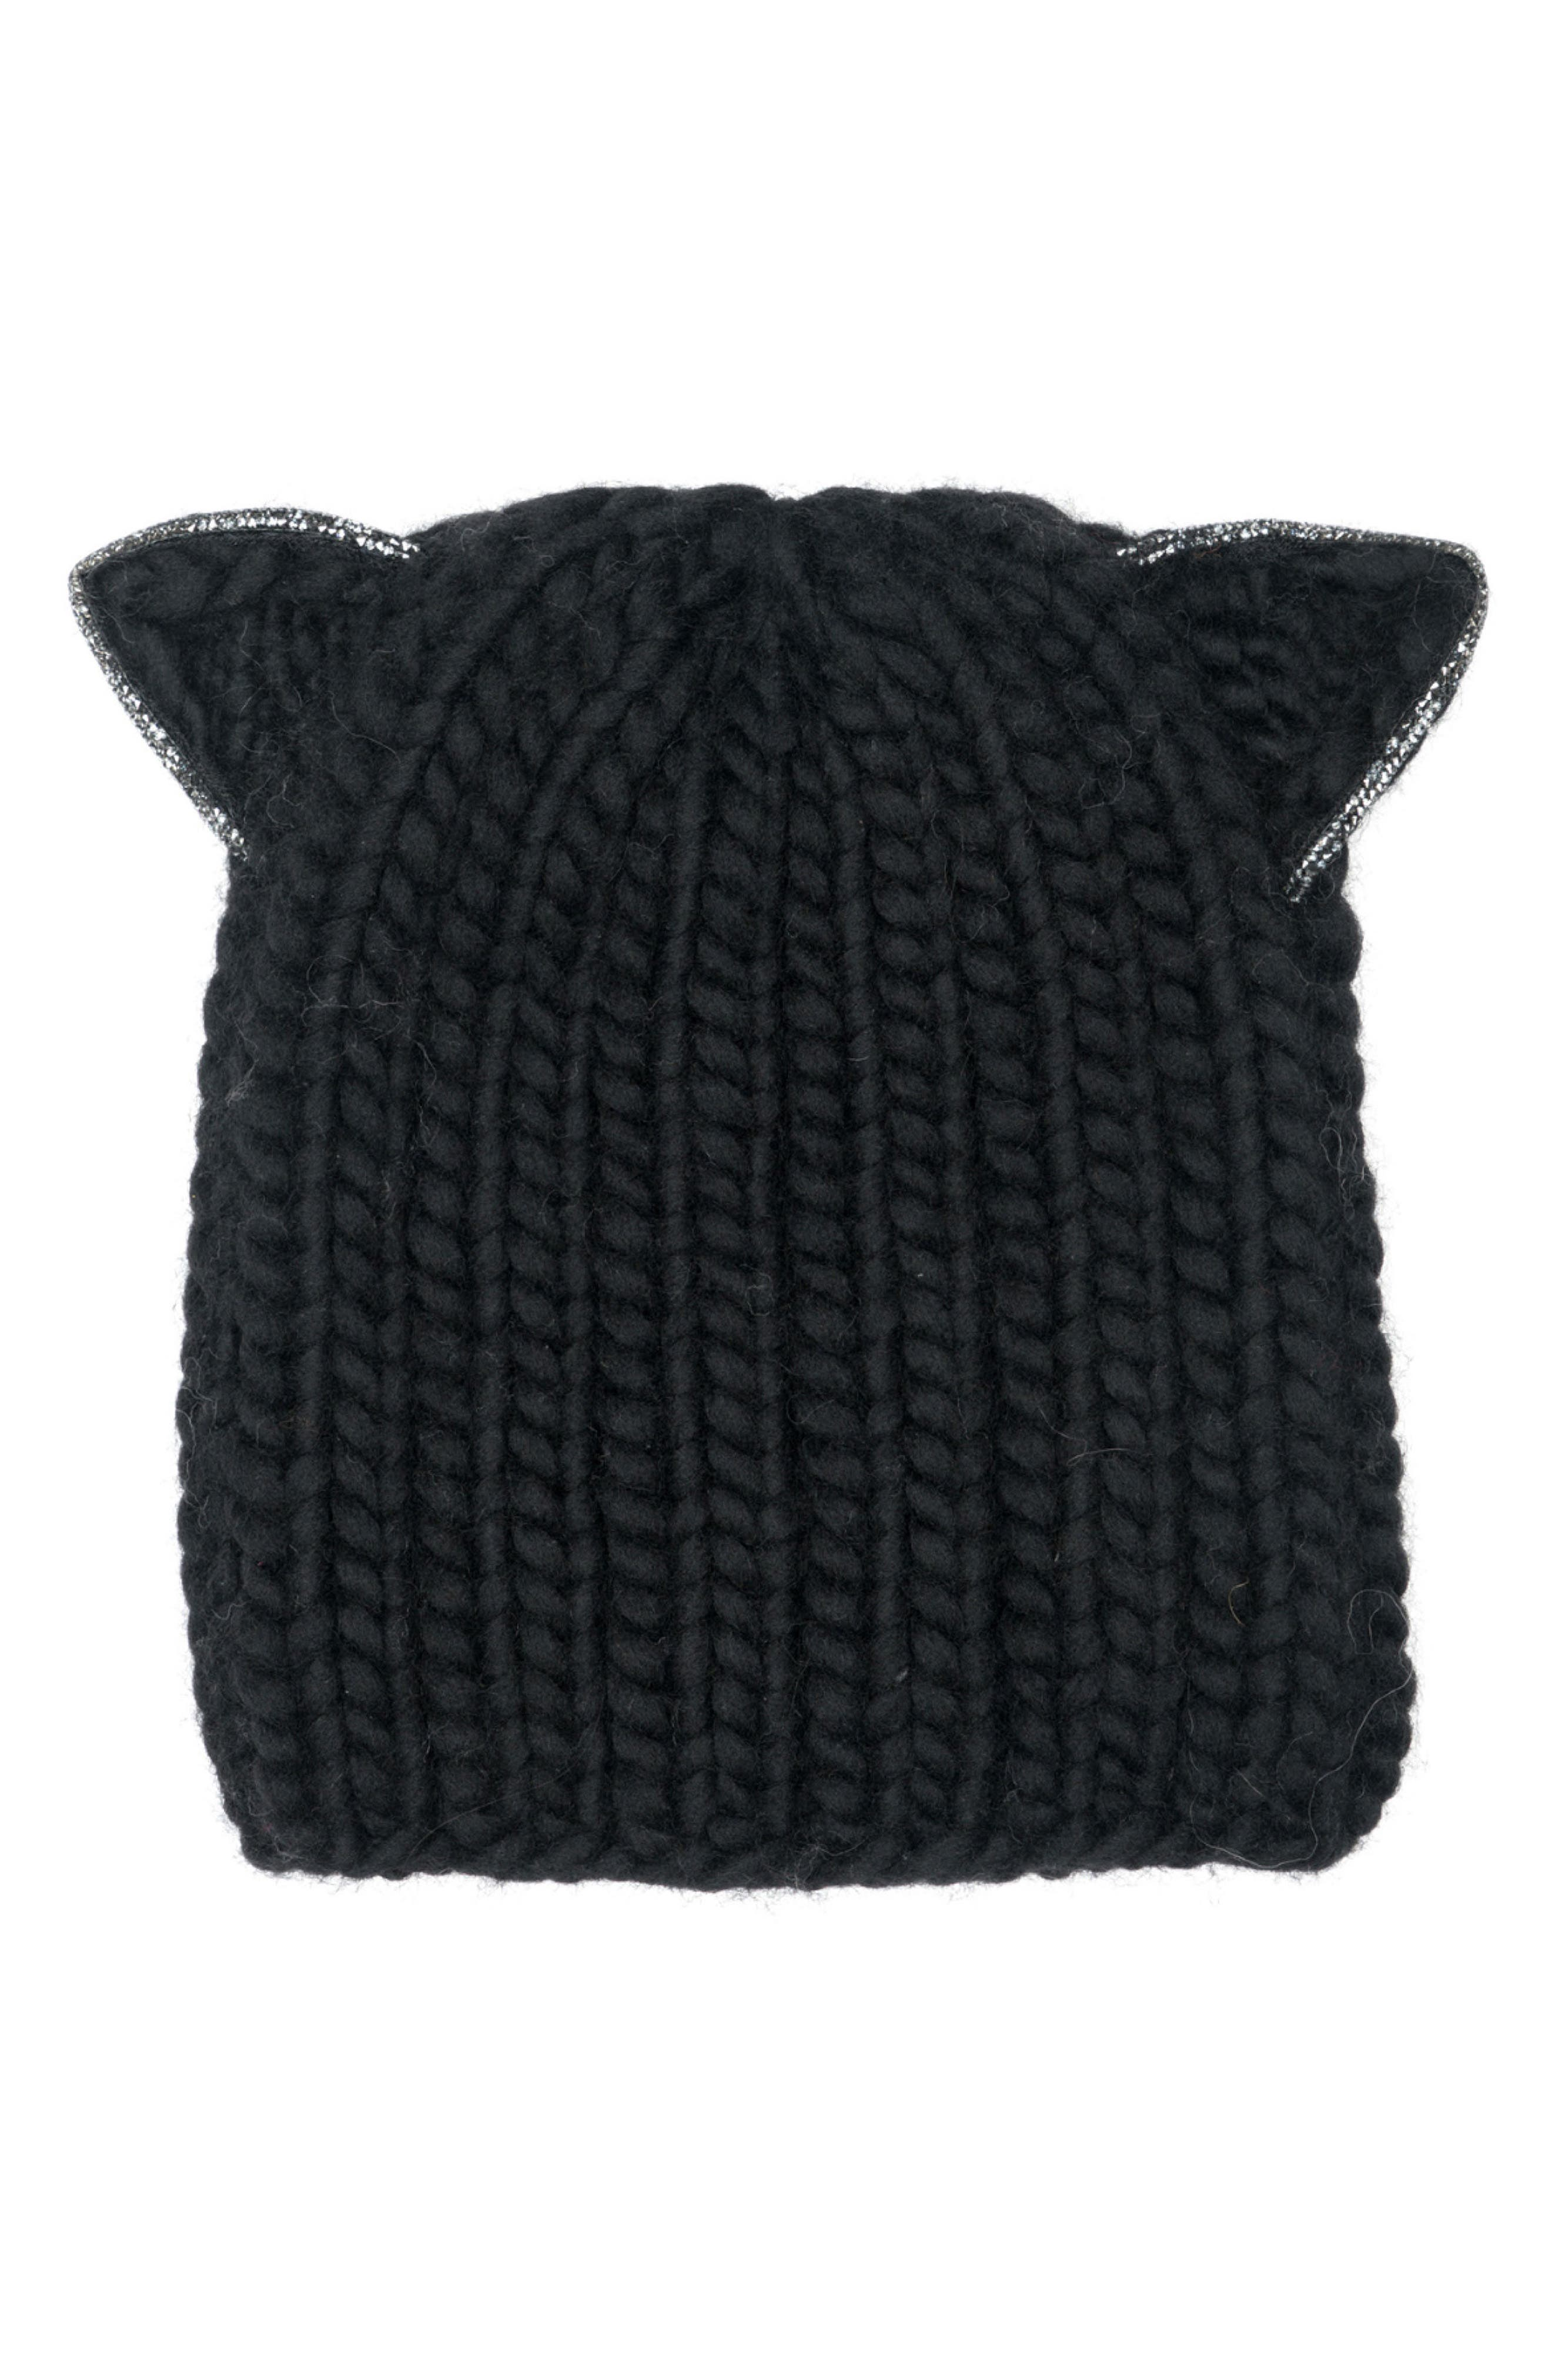 Felix Cat Ears Wool Knit Beanie,                             Main thumbnail 1, color,                             Black